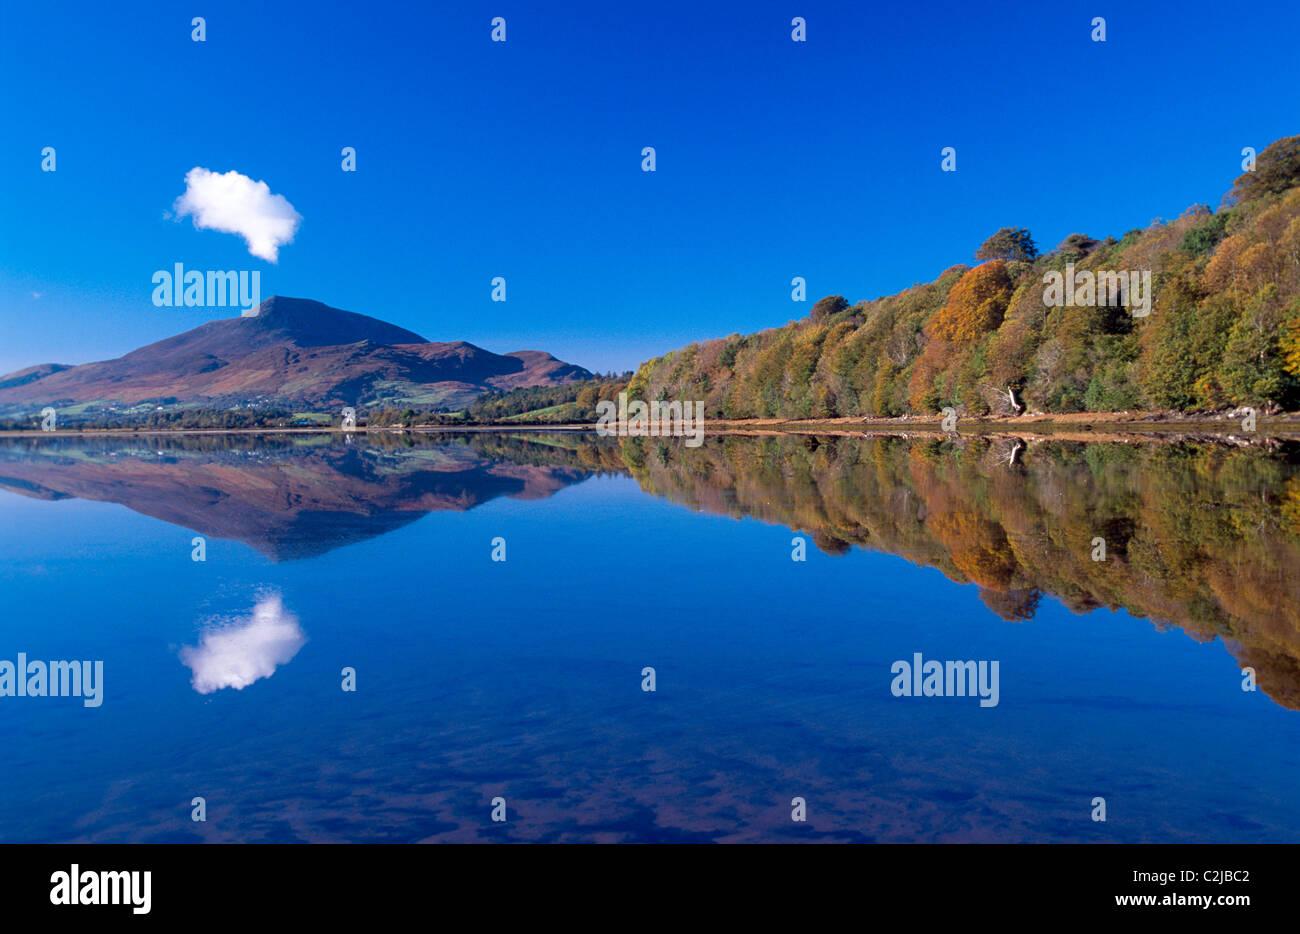 Otoño Reflexión de Muckish Montaña, Condado de Donegal, Irlanda. Imagen De Stock